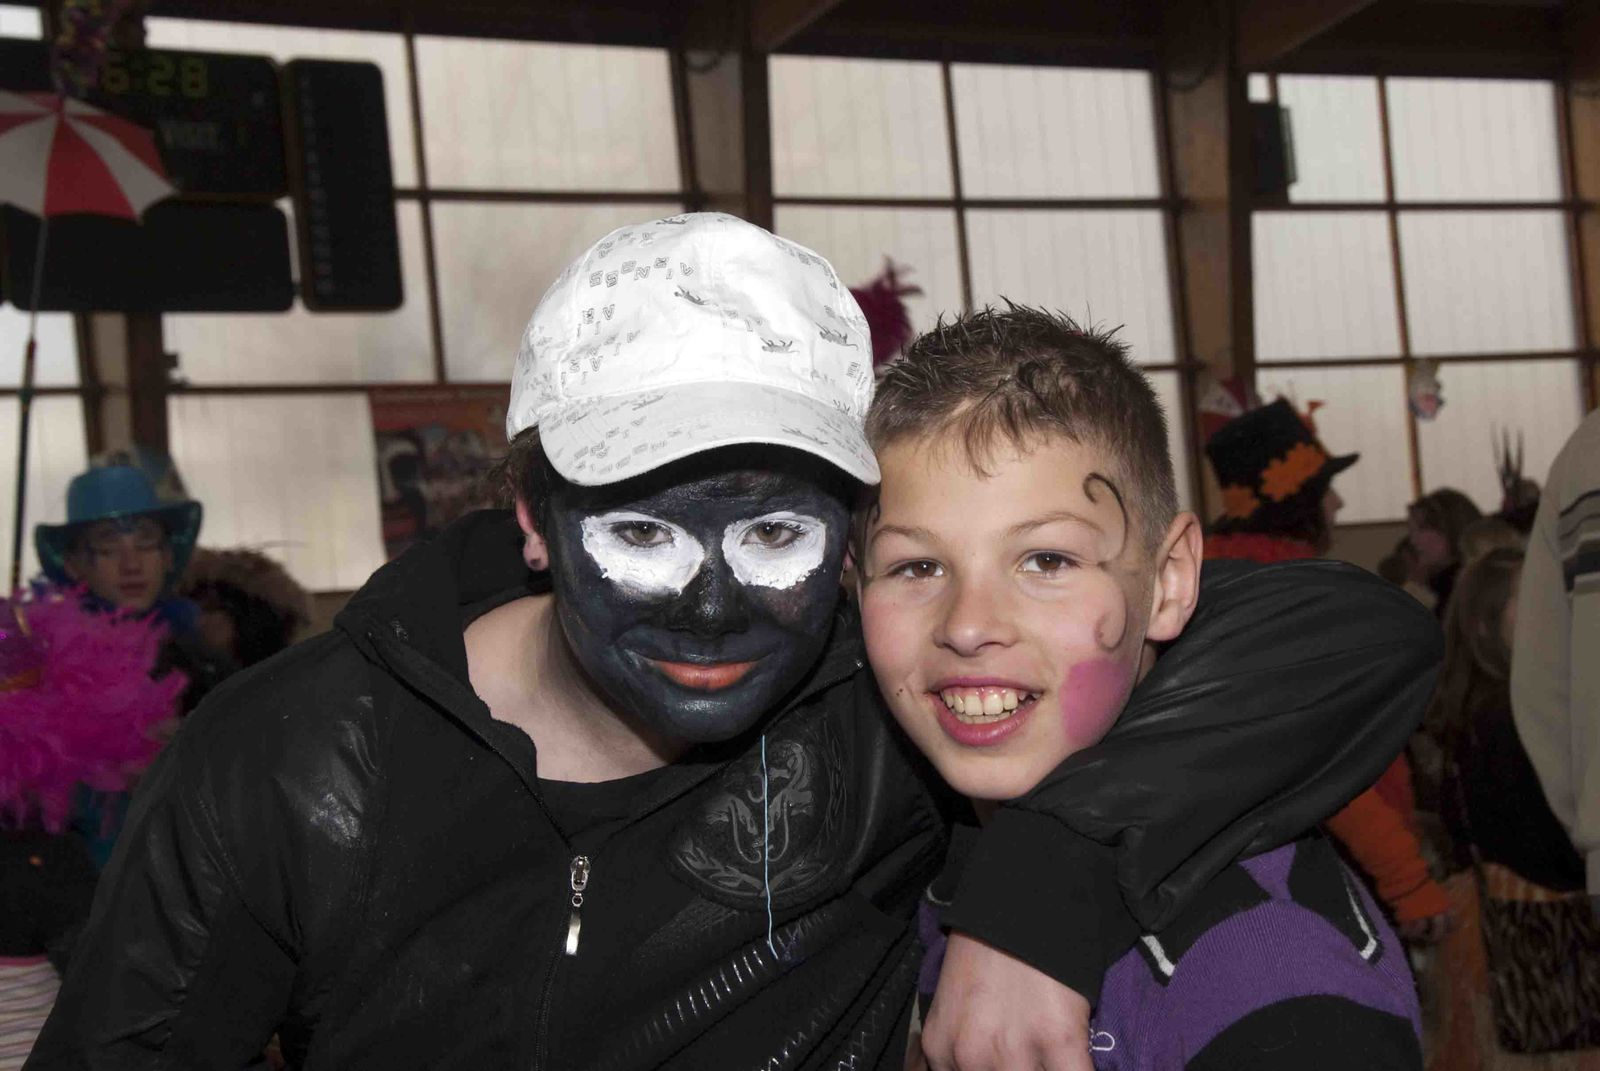 Bal enfantin - Coudekerque-Br. 2010